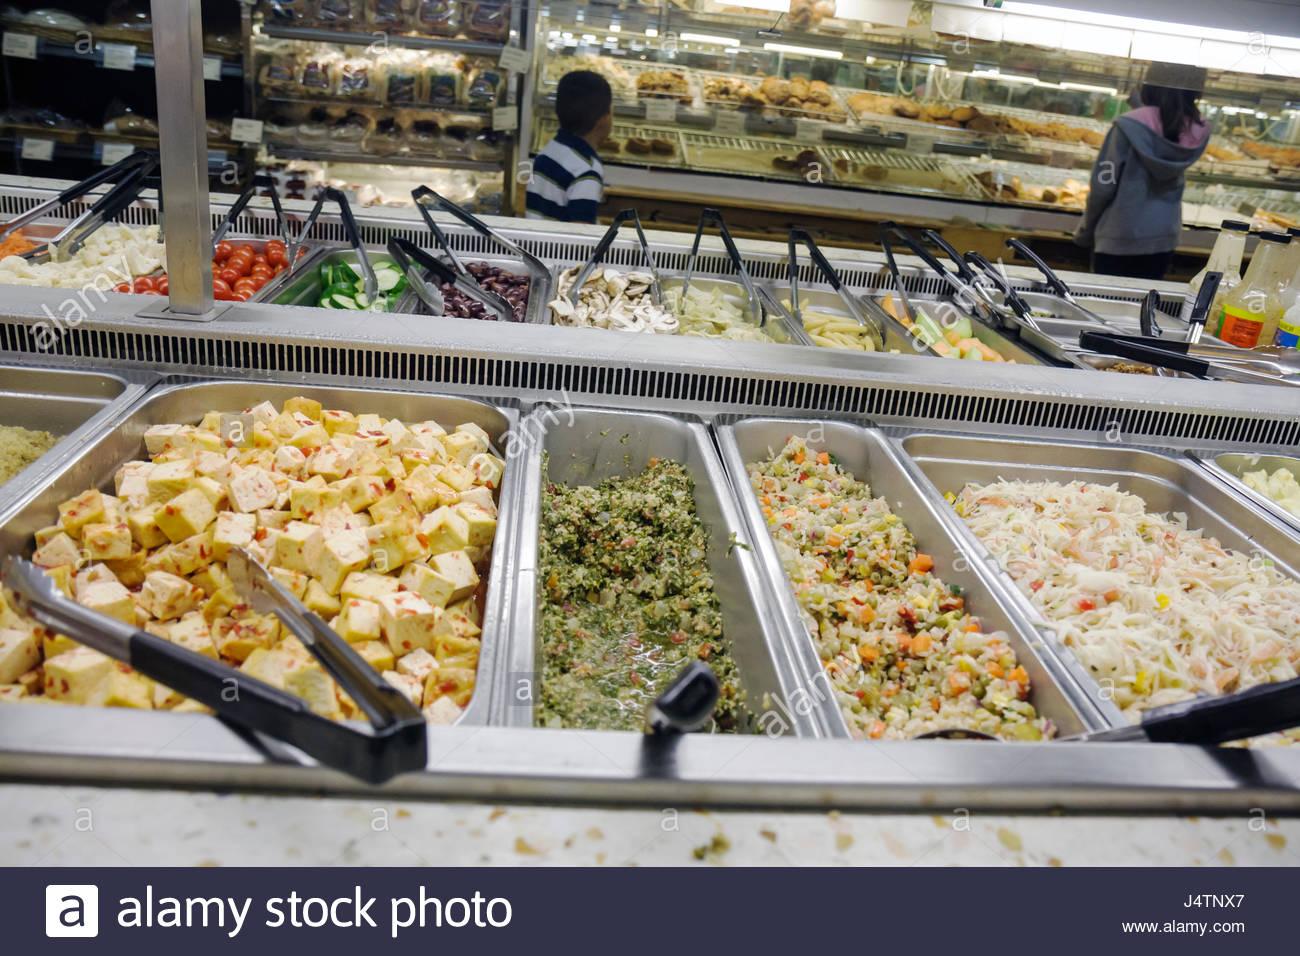 Miami beach florida whole foods market company business for Food bar whole foods